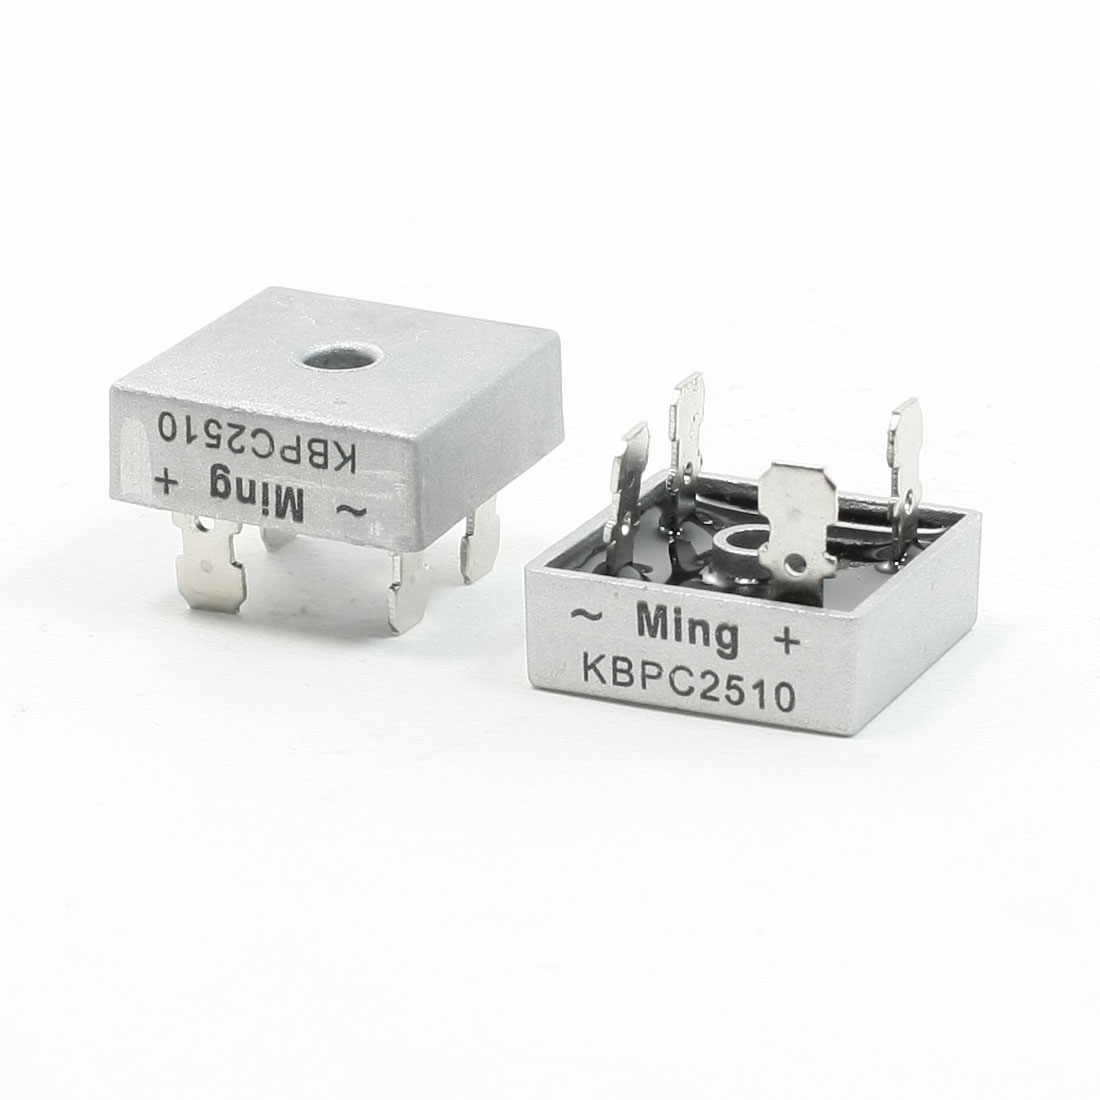 2 Pcs Square Silver Tone Head 1000V 25A Full Wave Bridge Rectifier